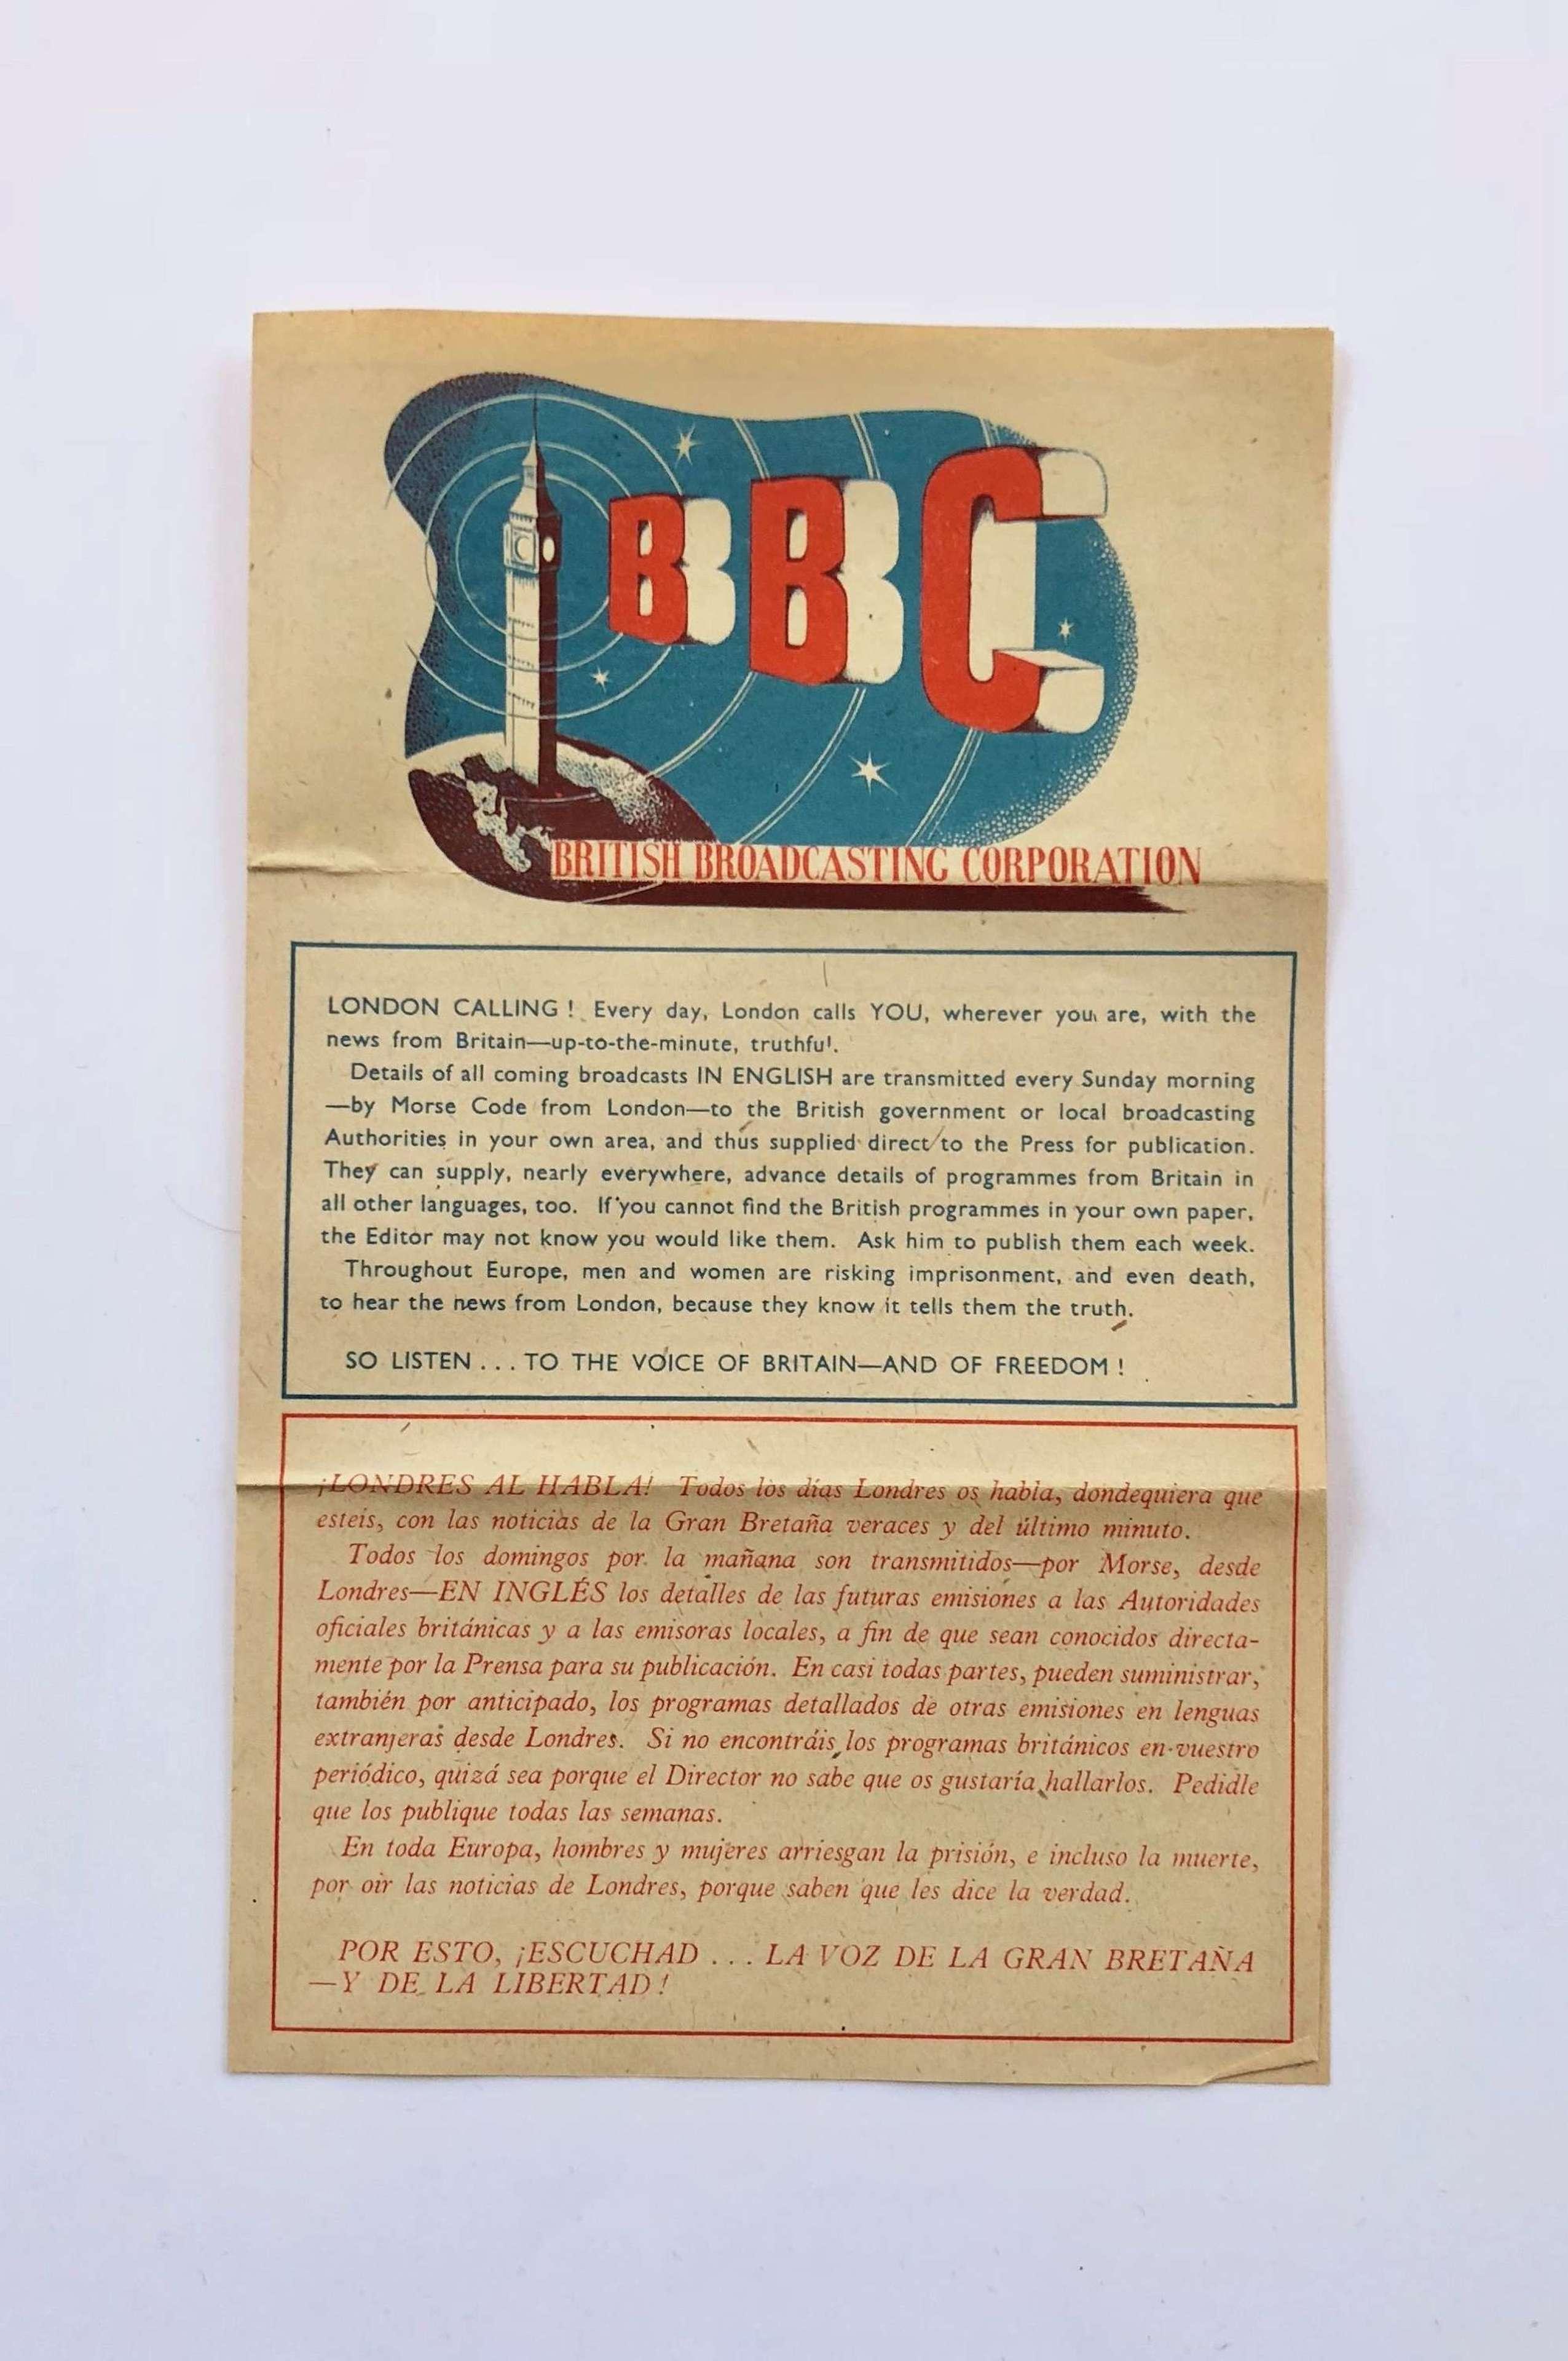 WW2 BBC London Calling Leaflet.